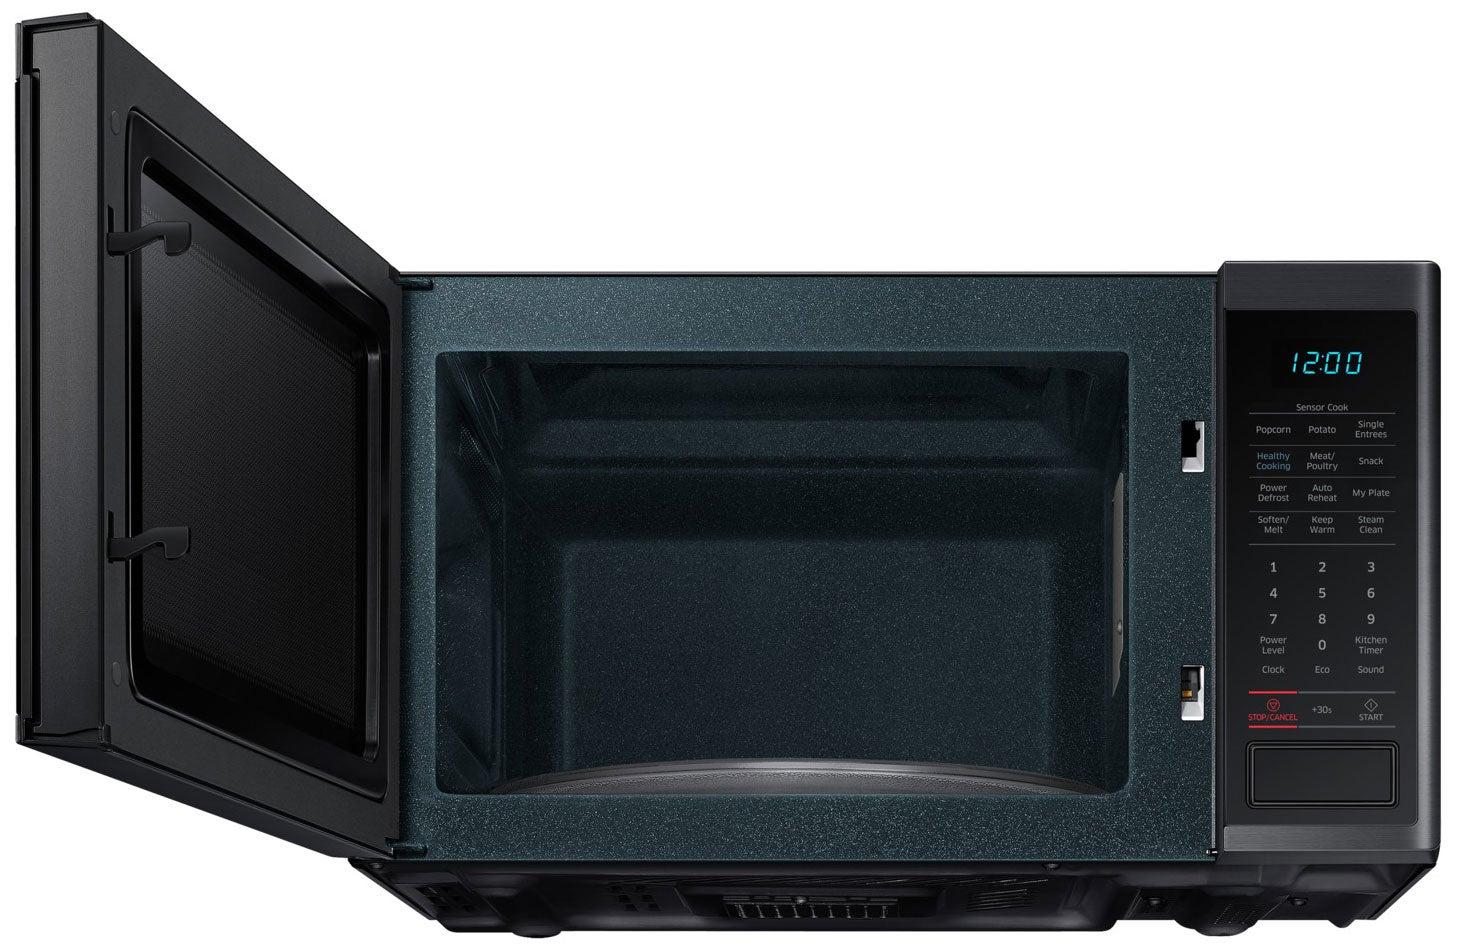 Samsung 40l Microwave Ms40j5133bg Buy Microwaves